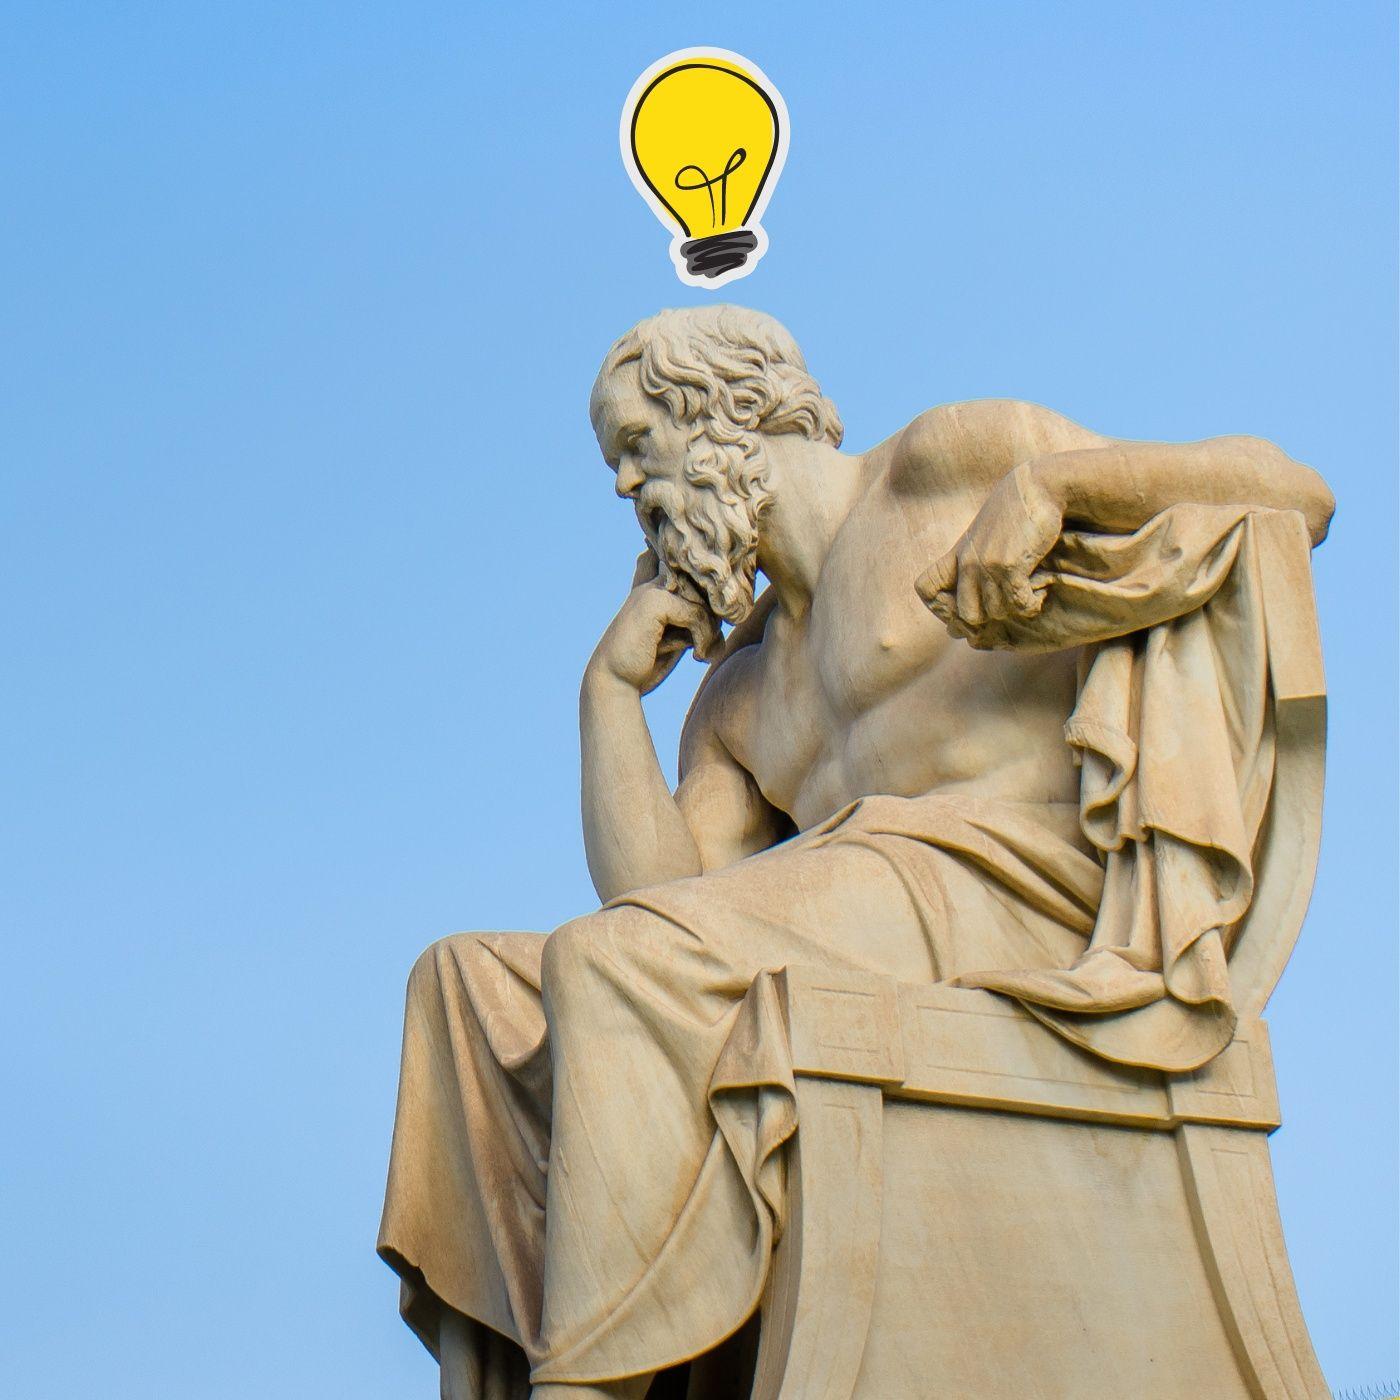 Asesoramiento filosófico | 79 #sersiendo